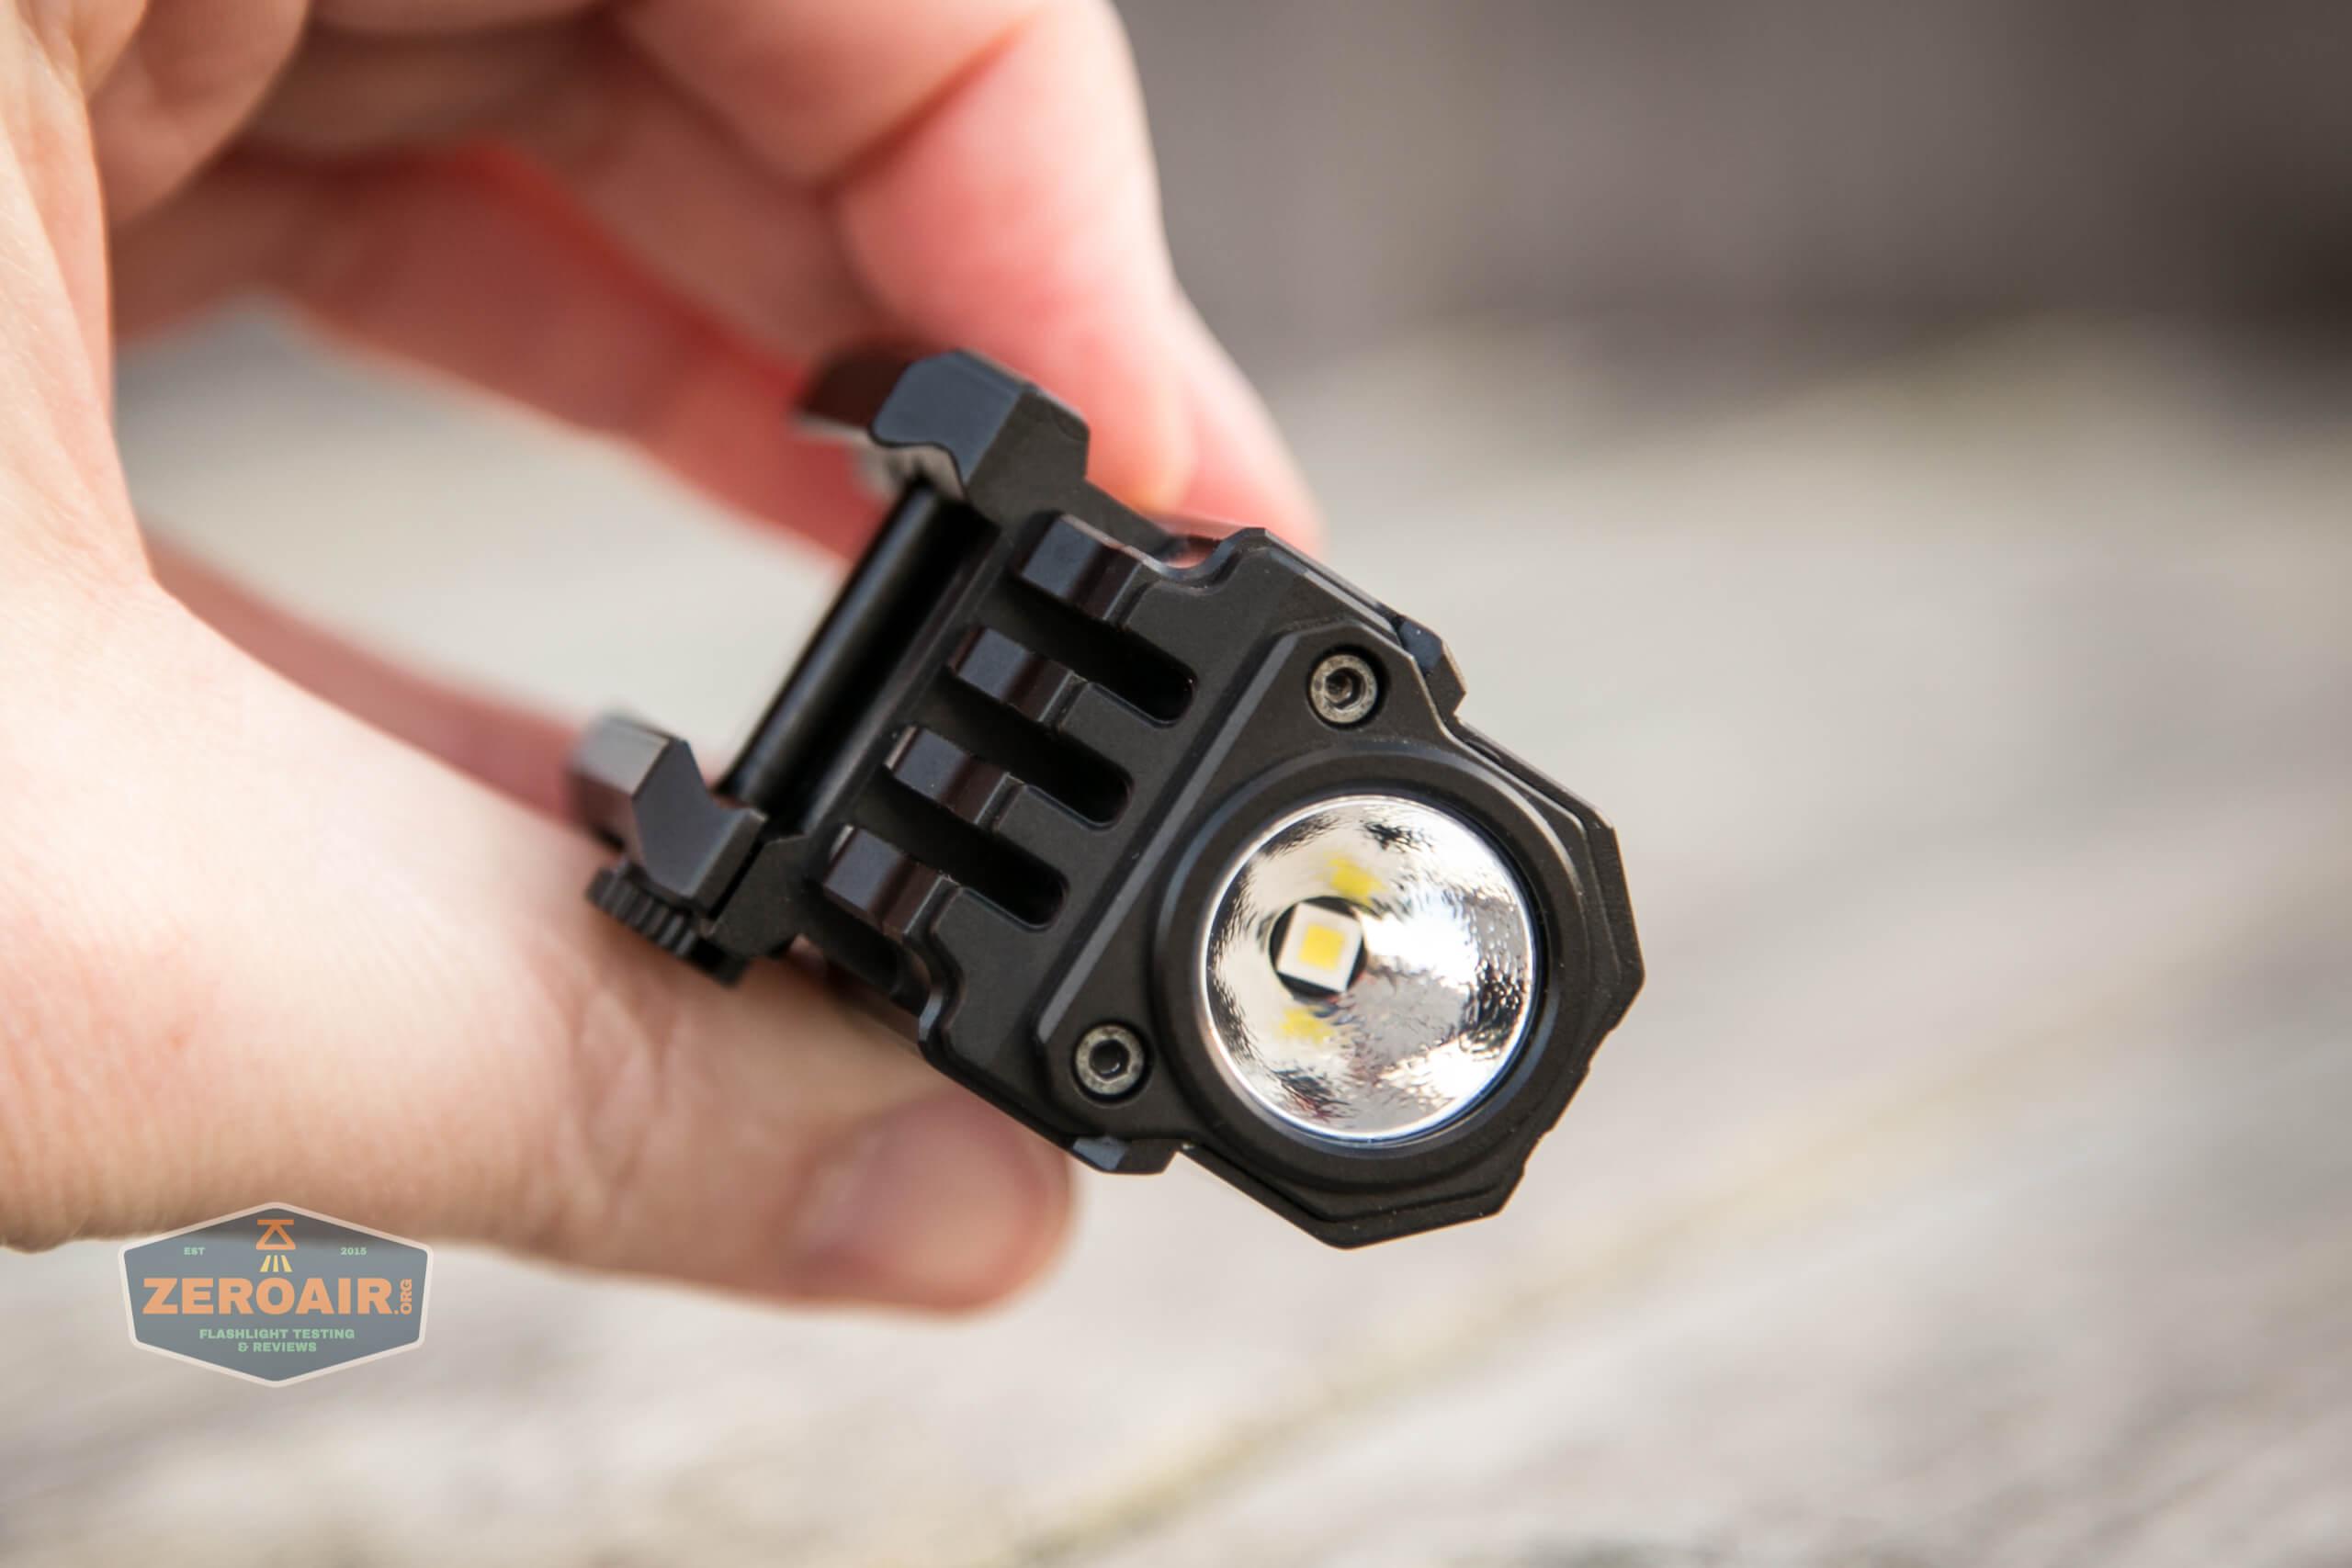 imalent ut10 tactical weapon flashlight